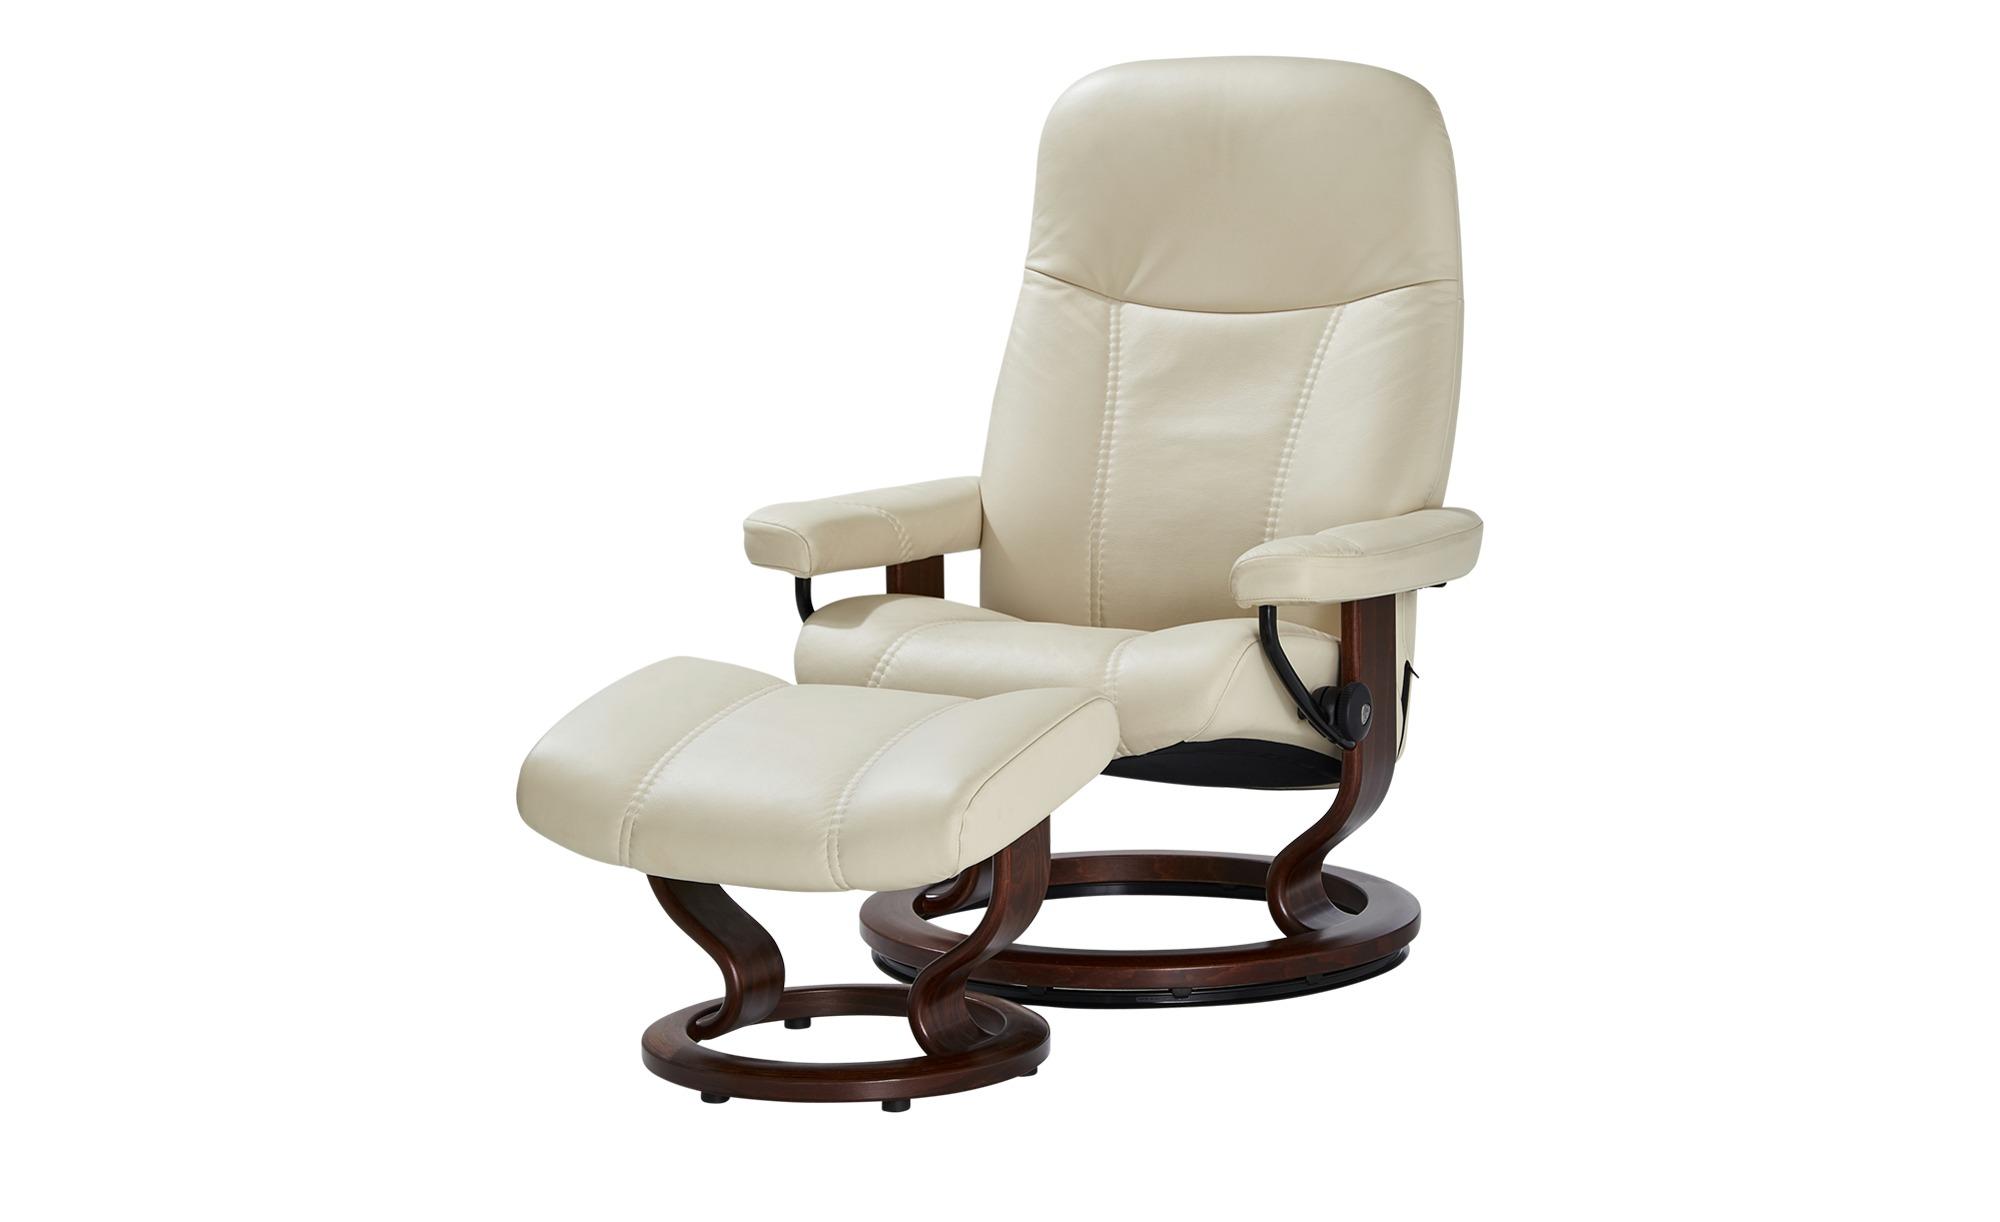 Stressless Relaxsessel mit Hocker  Consul ¦ creme ¦ Maße (cm): B: 75 H: 100 T: 71 Polstermöbel > Sessel > Fernsehsessel - Höffner